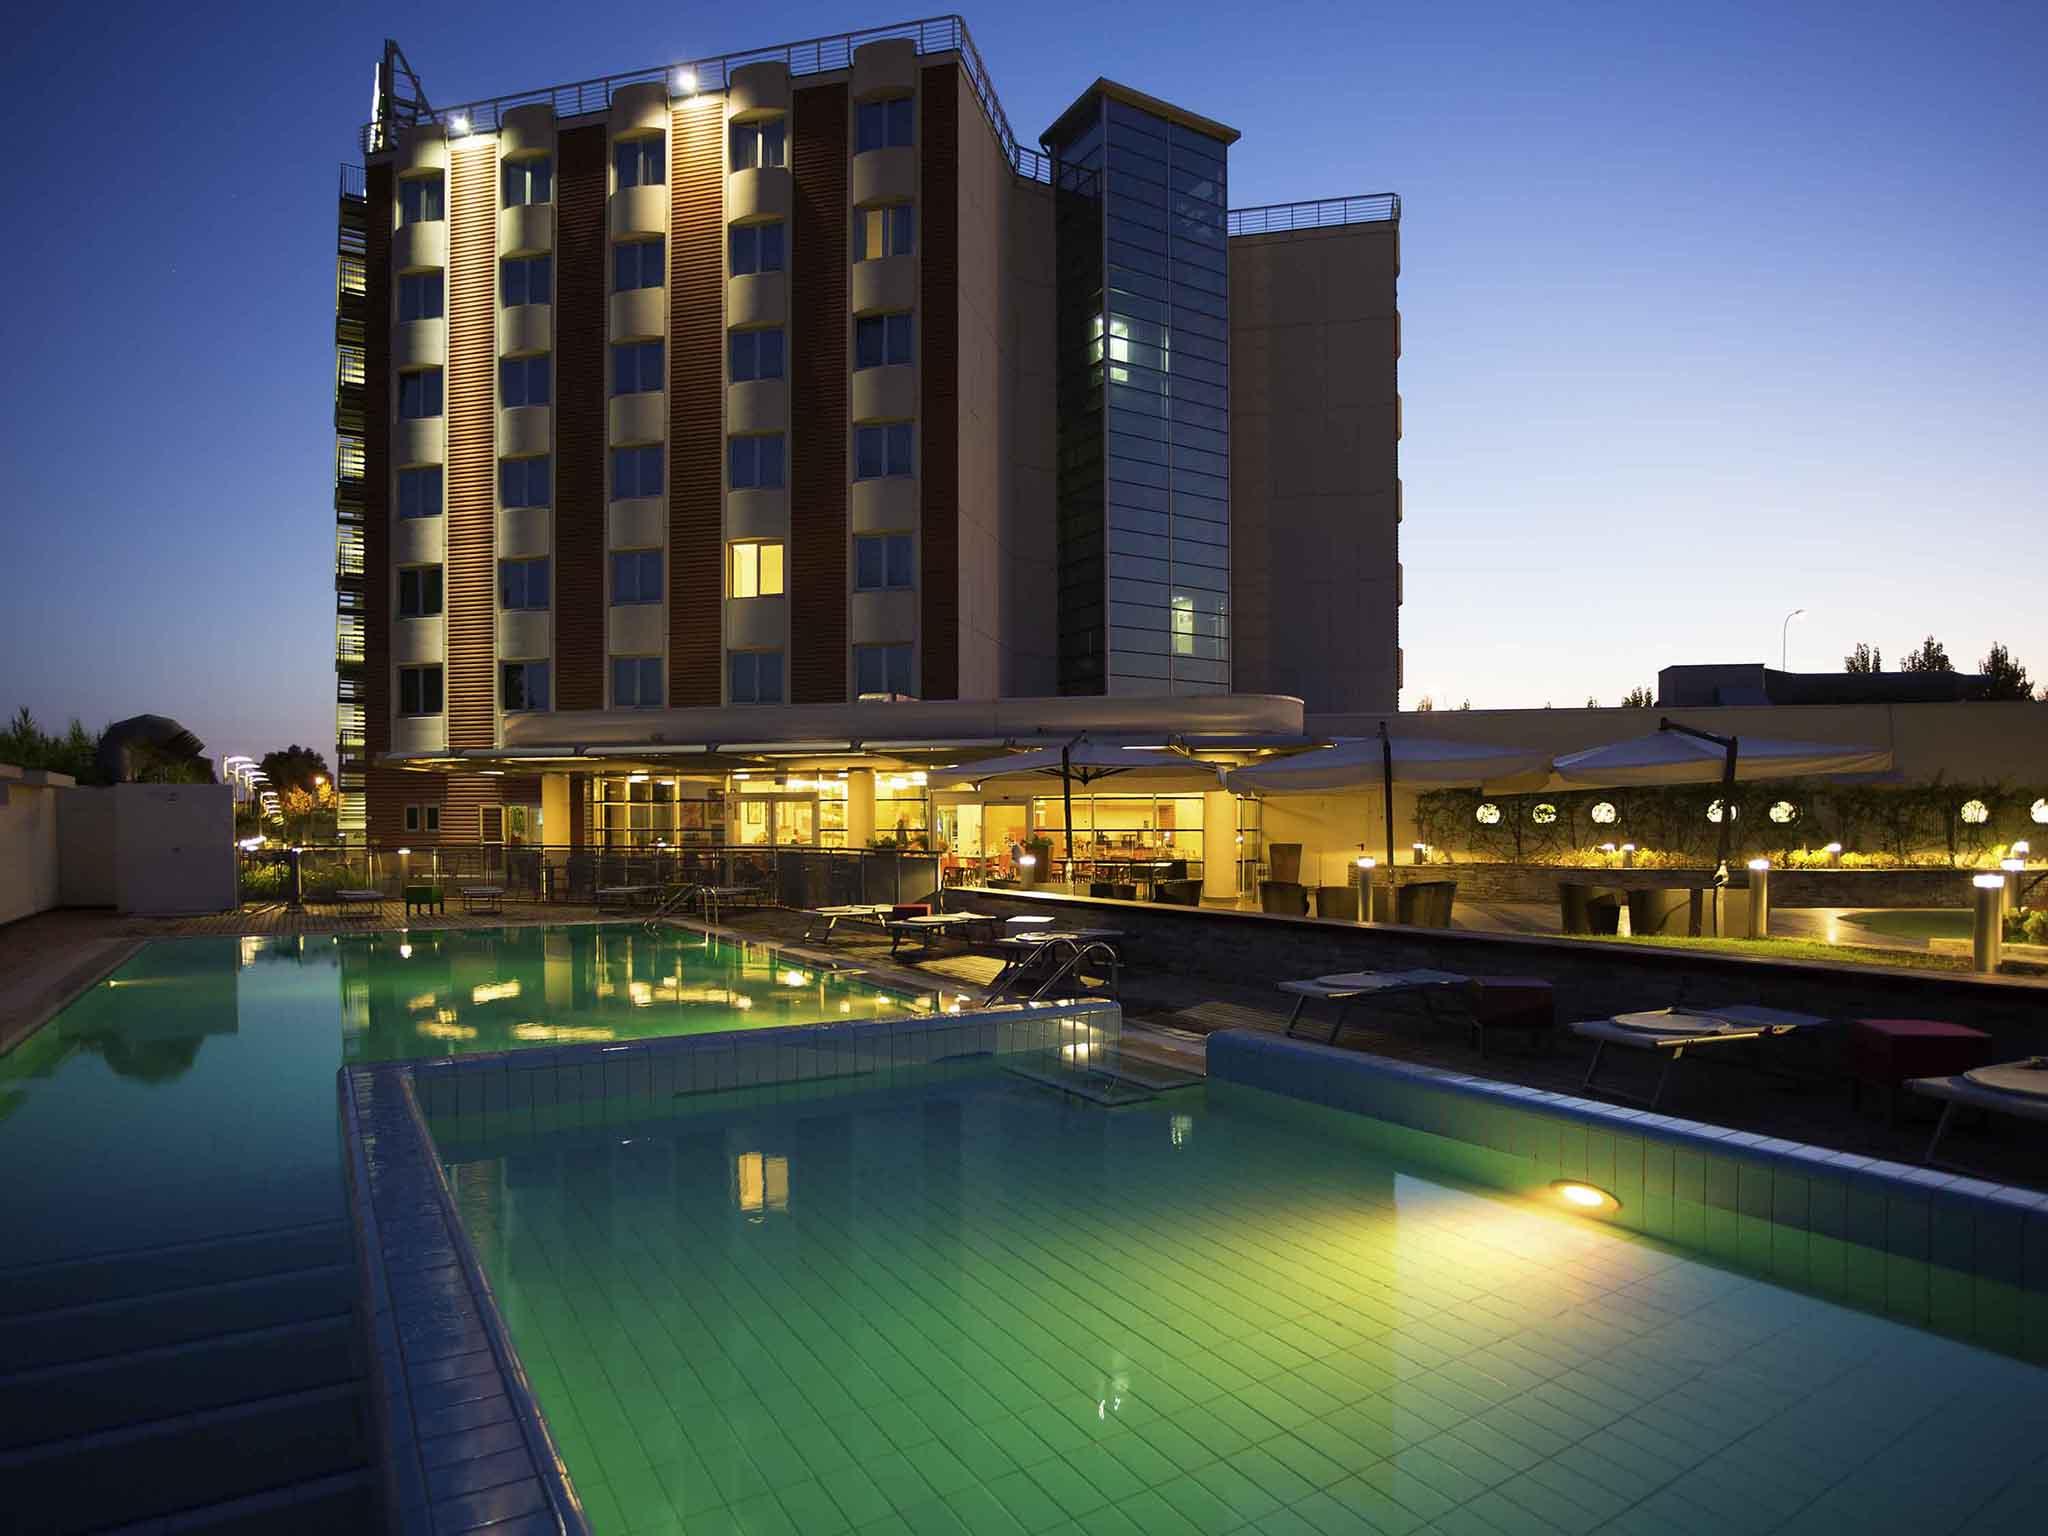 Hotel – Novotel Salerno Est Arechi